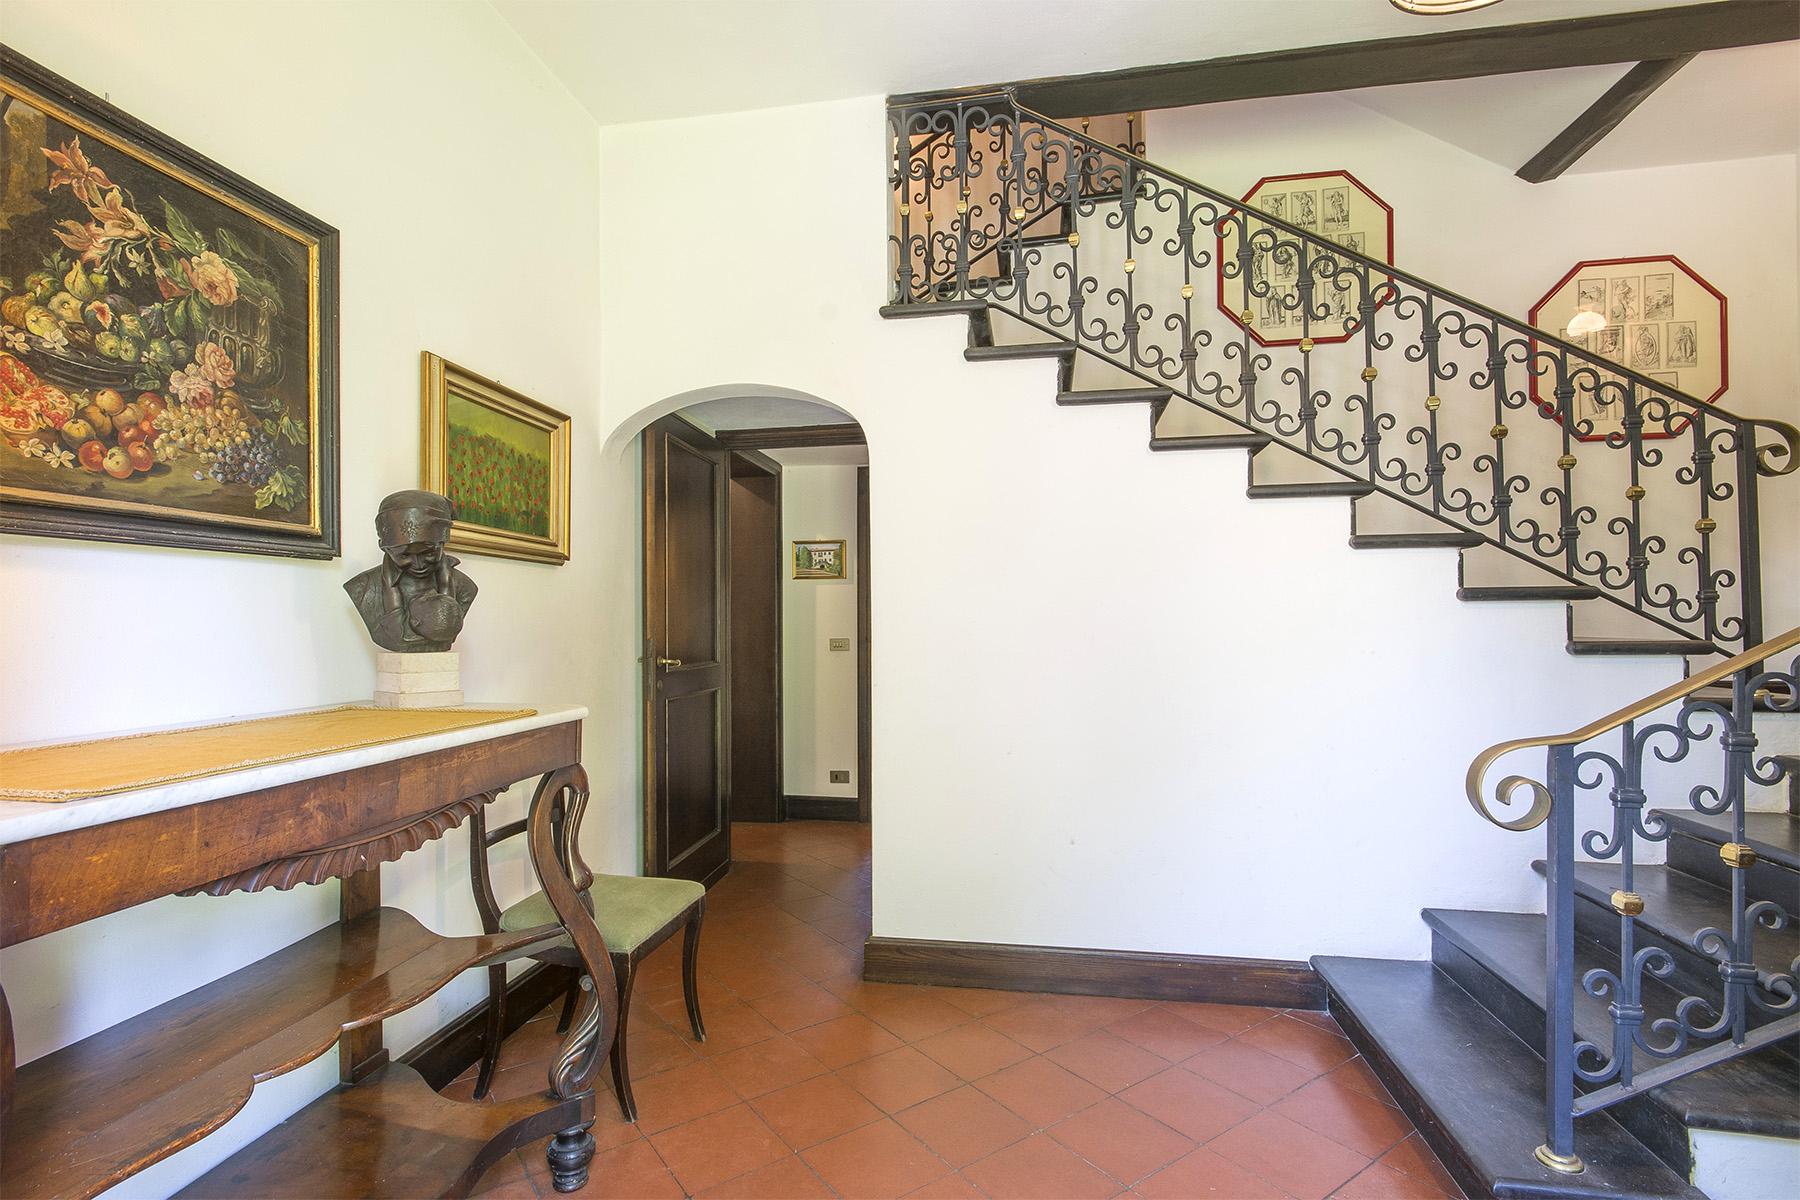 Villa in Vendita a Lucca: 5 locali, 600 mq - Foto 16